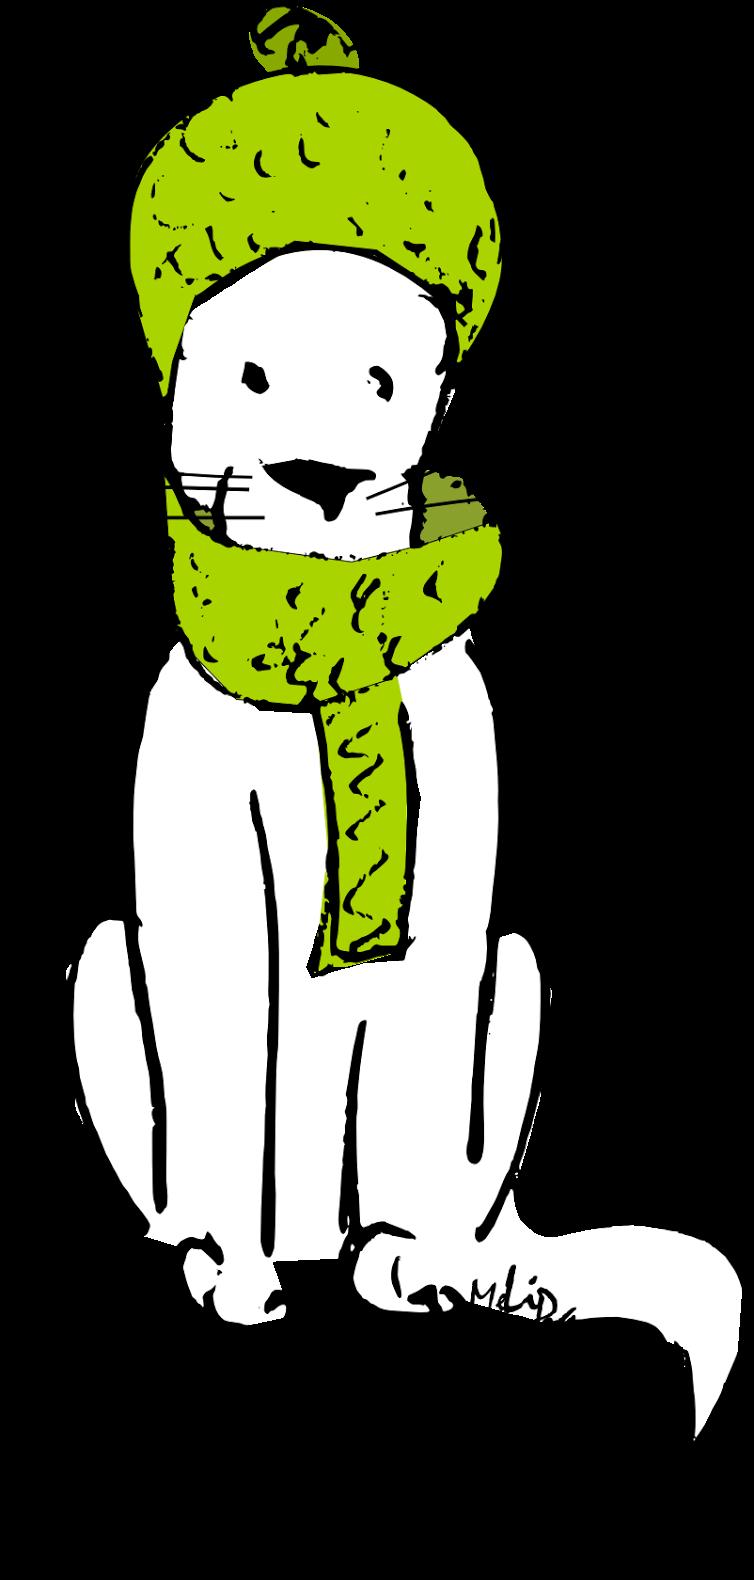 Winter Cat Clipart - Winter Cat Clipart (784x1600)